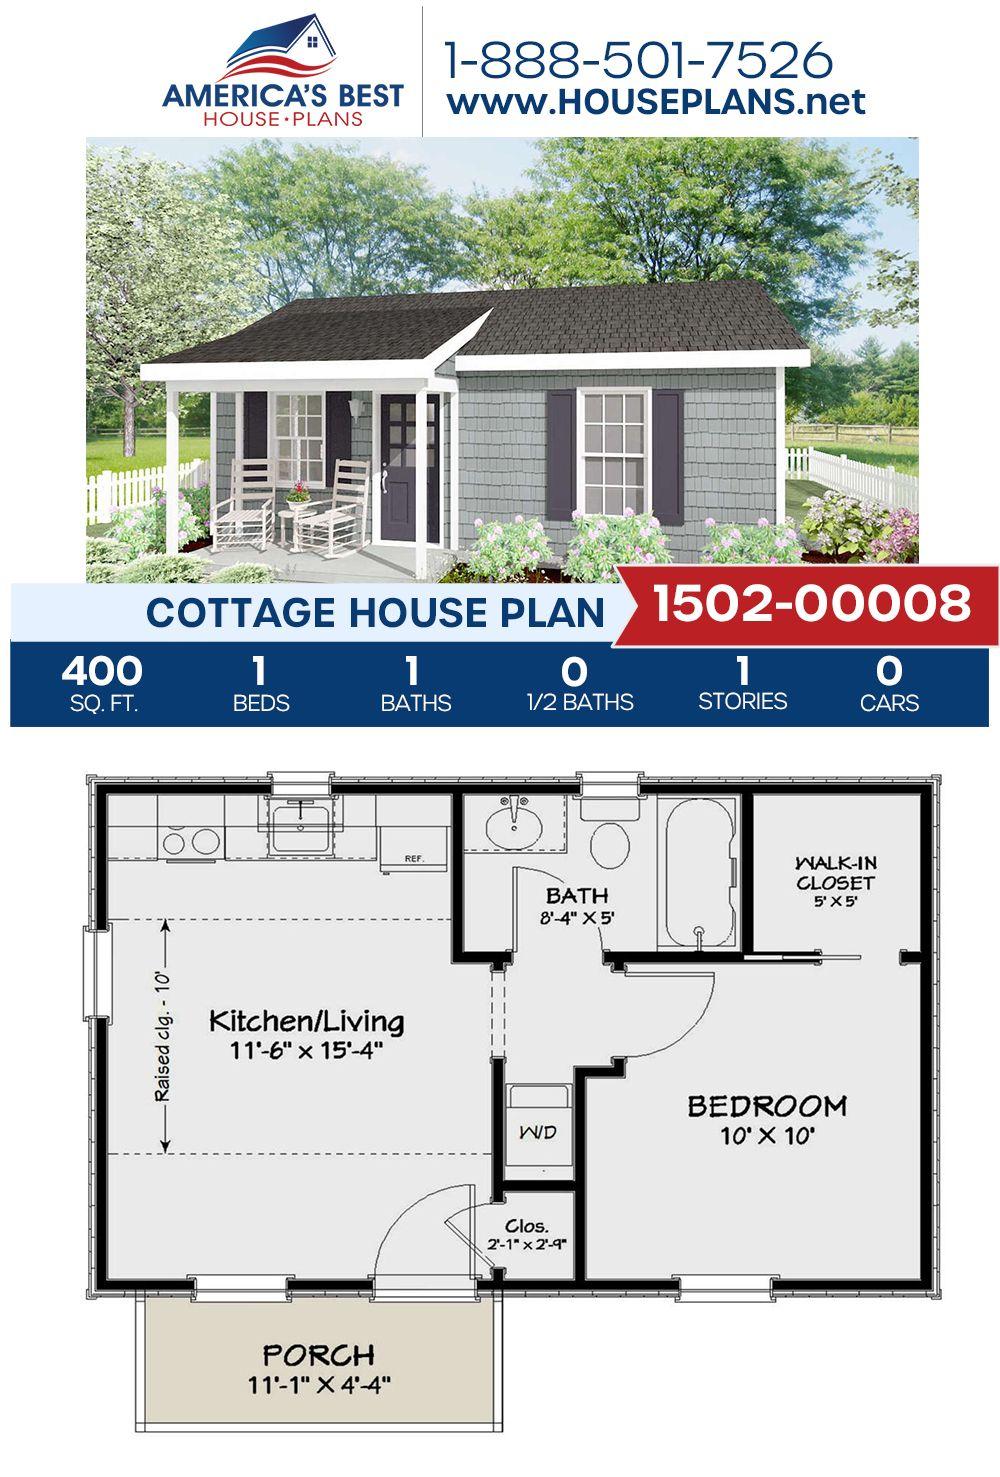 House Plan 1502 00008 Cottage Plan 400 Square Feet 1 Bedroom 1 Bathroom Guest House Plans Cottage House Plans Cottage Plan